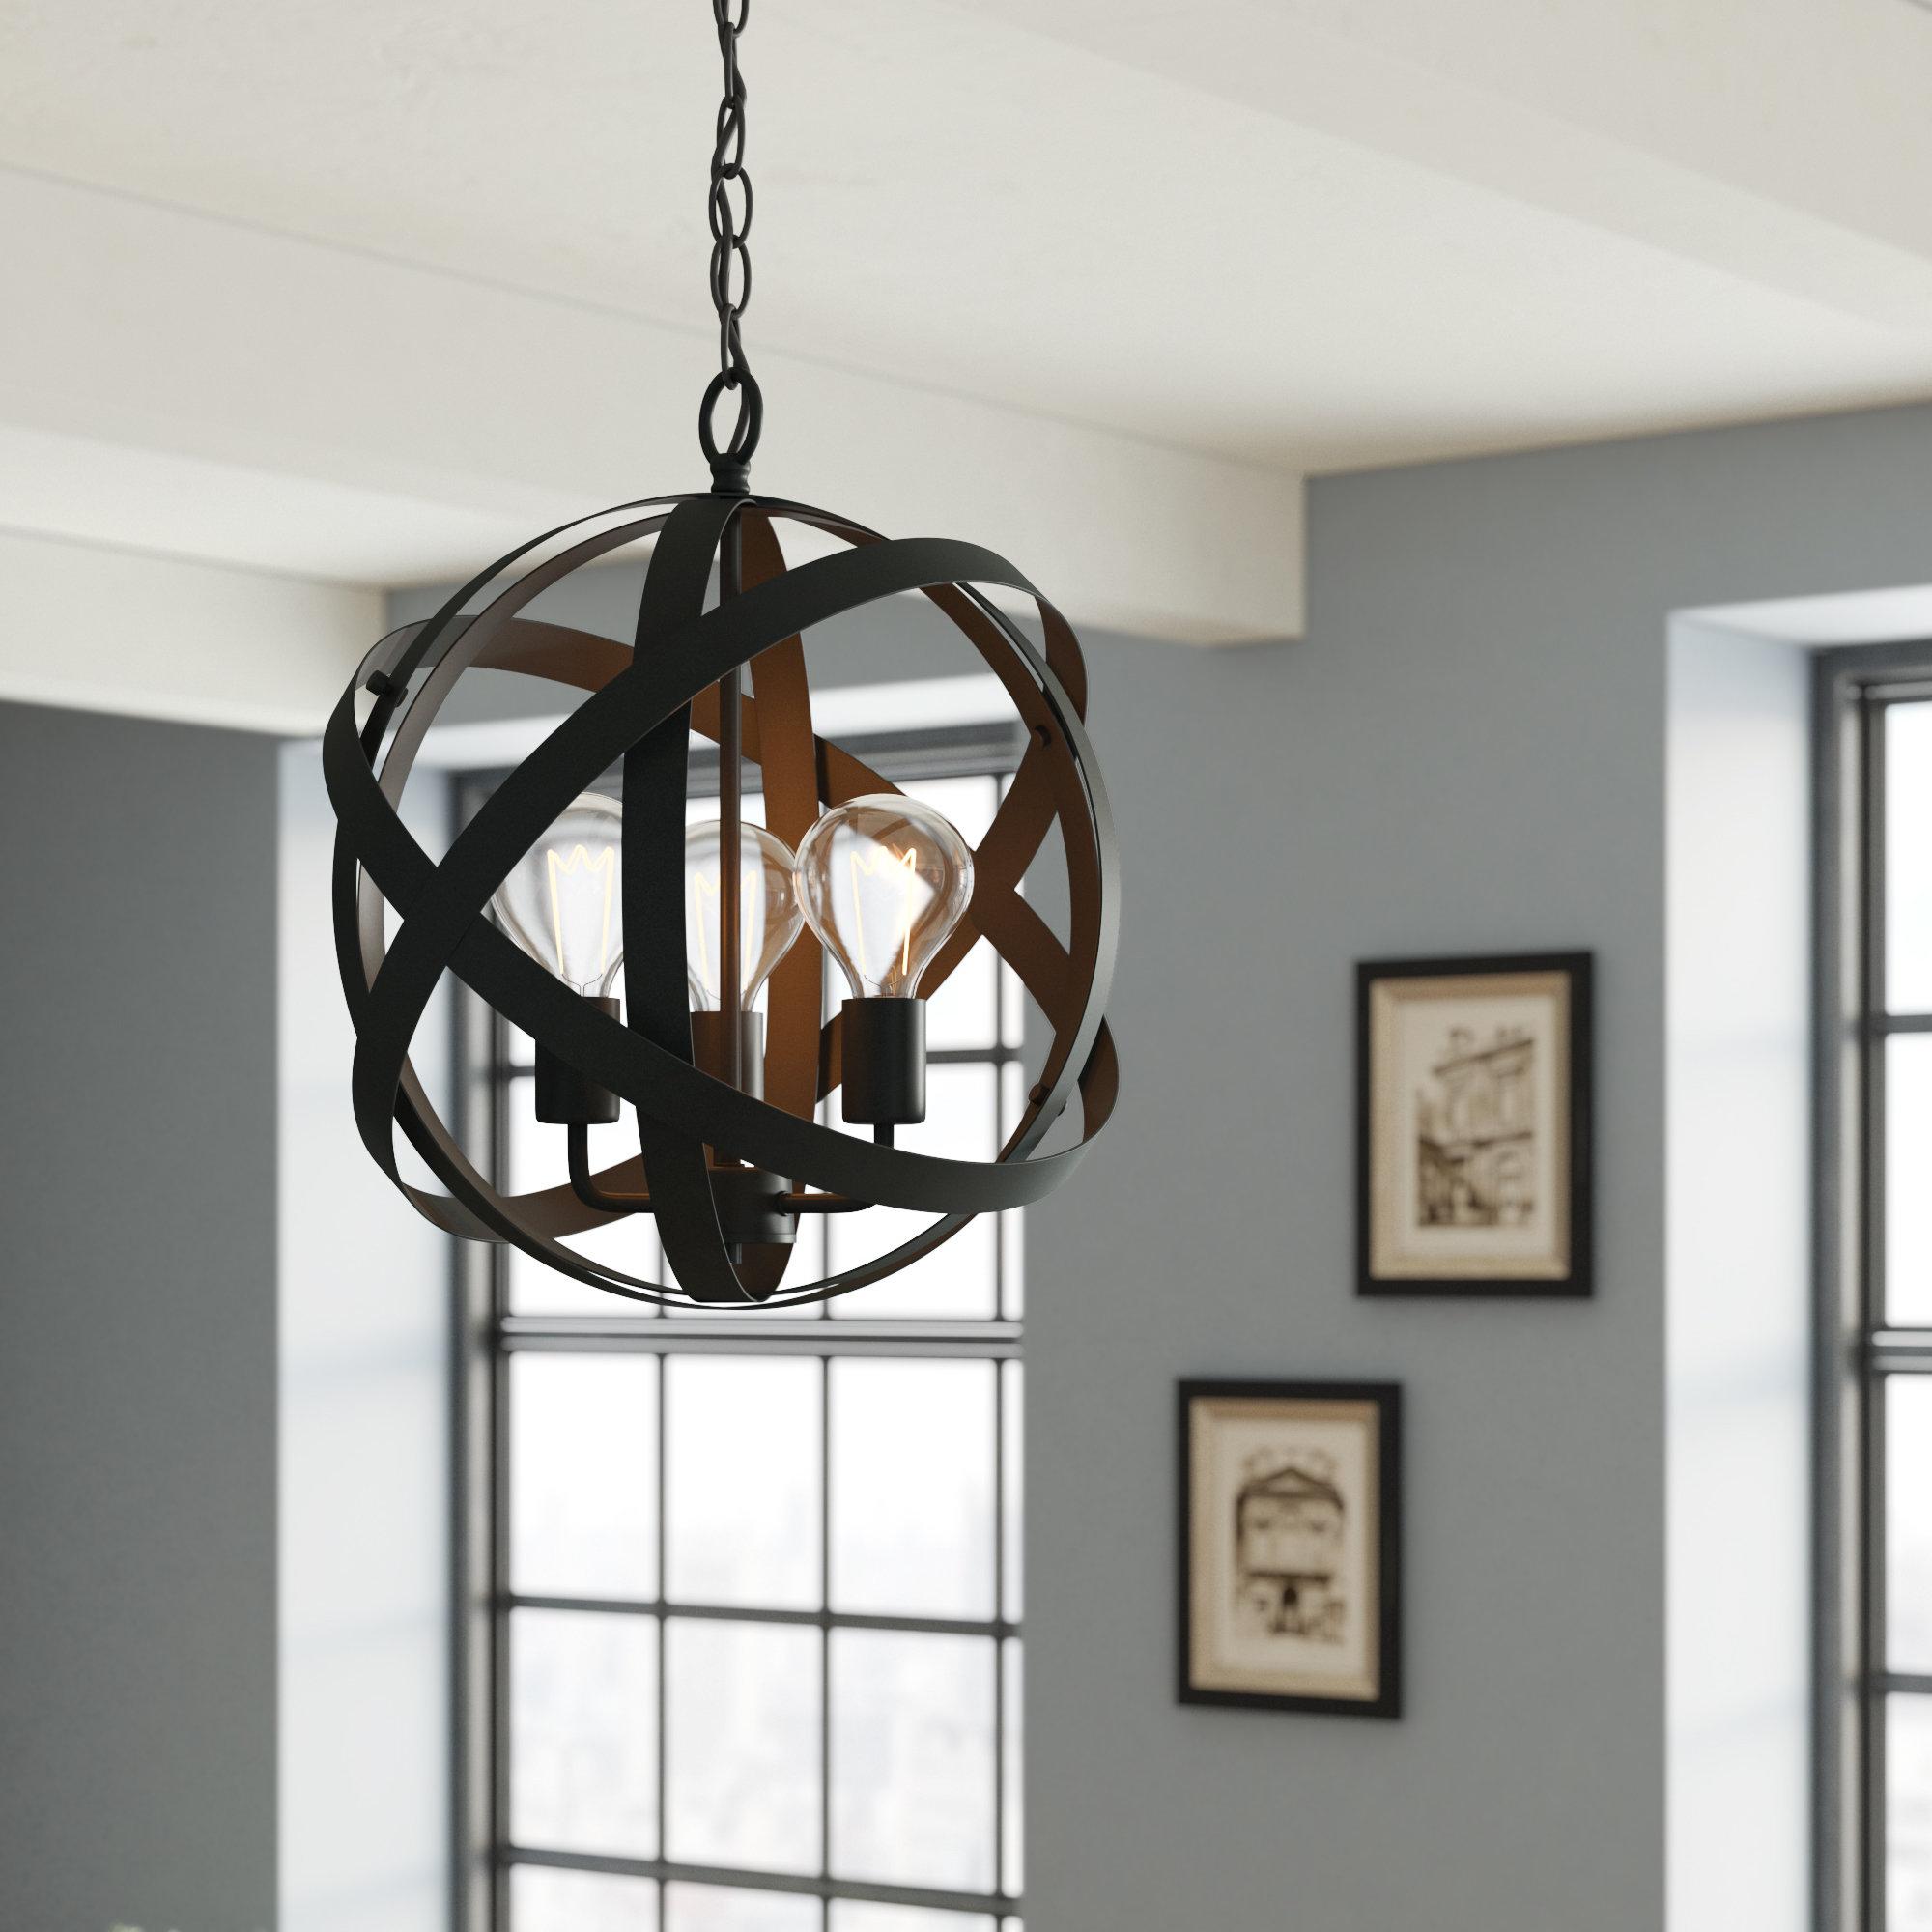 Annuziata 3 Light Unique/statement Chandeliers Inside Preferred Framlingham 3 Light Globe Chandelier (View 9 of 25)